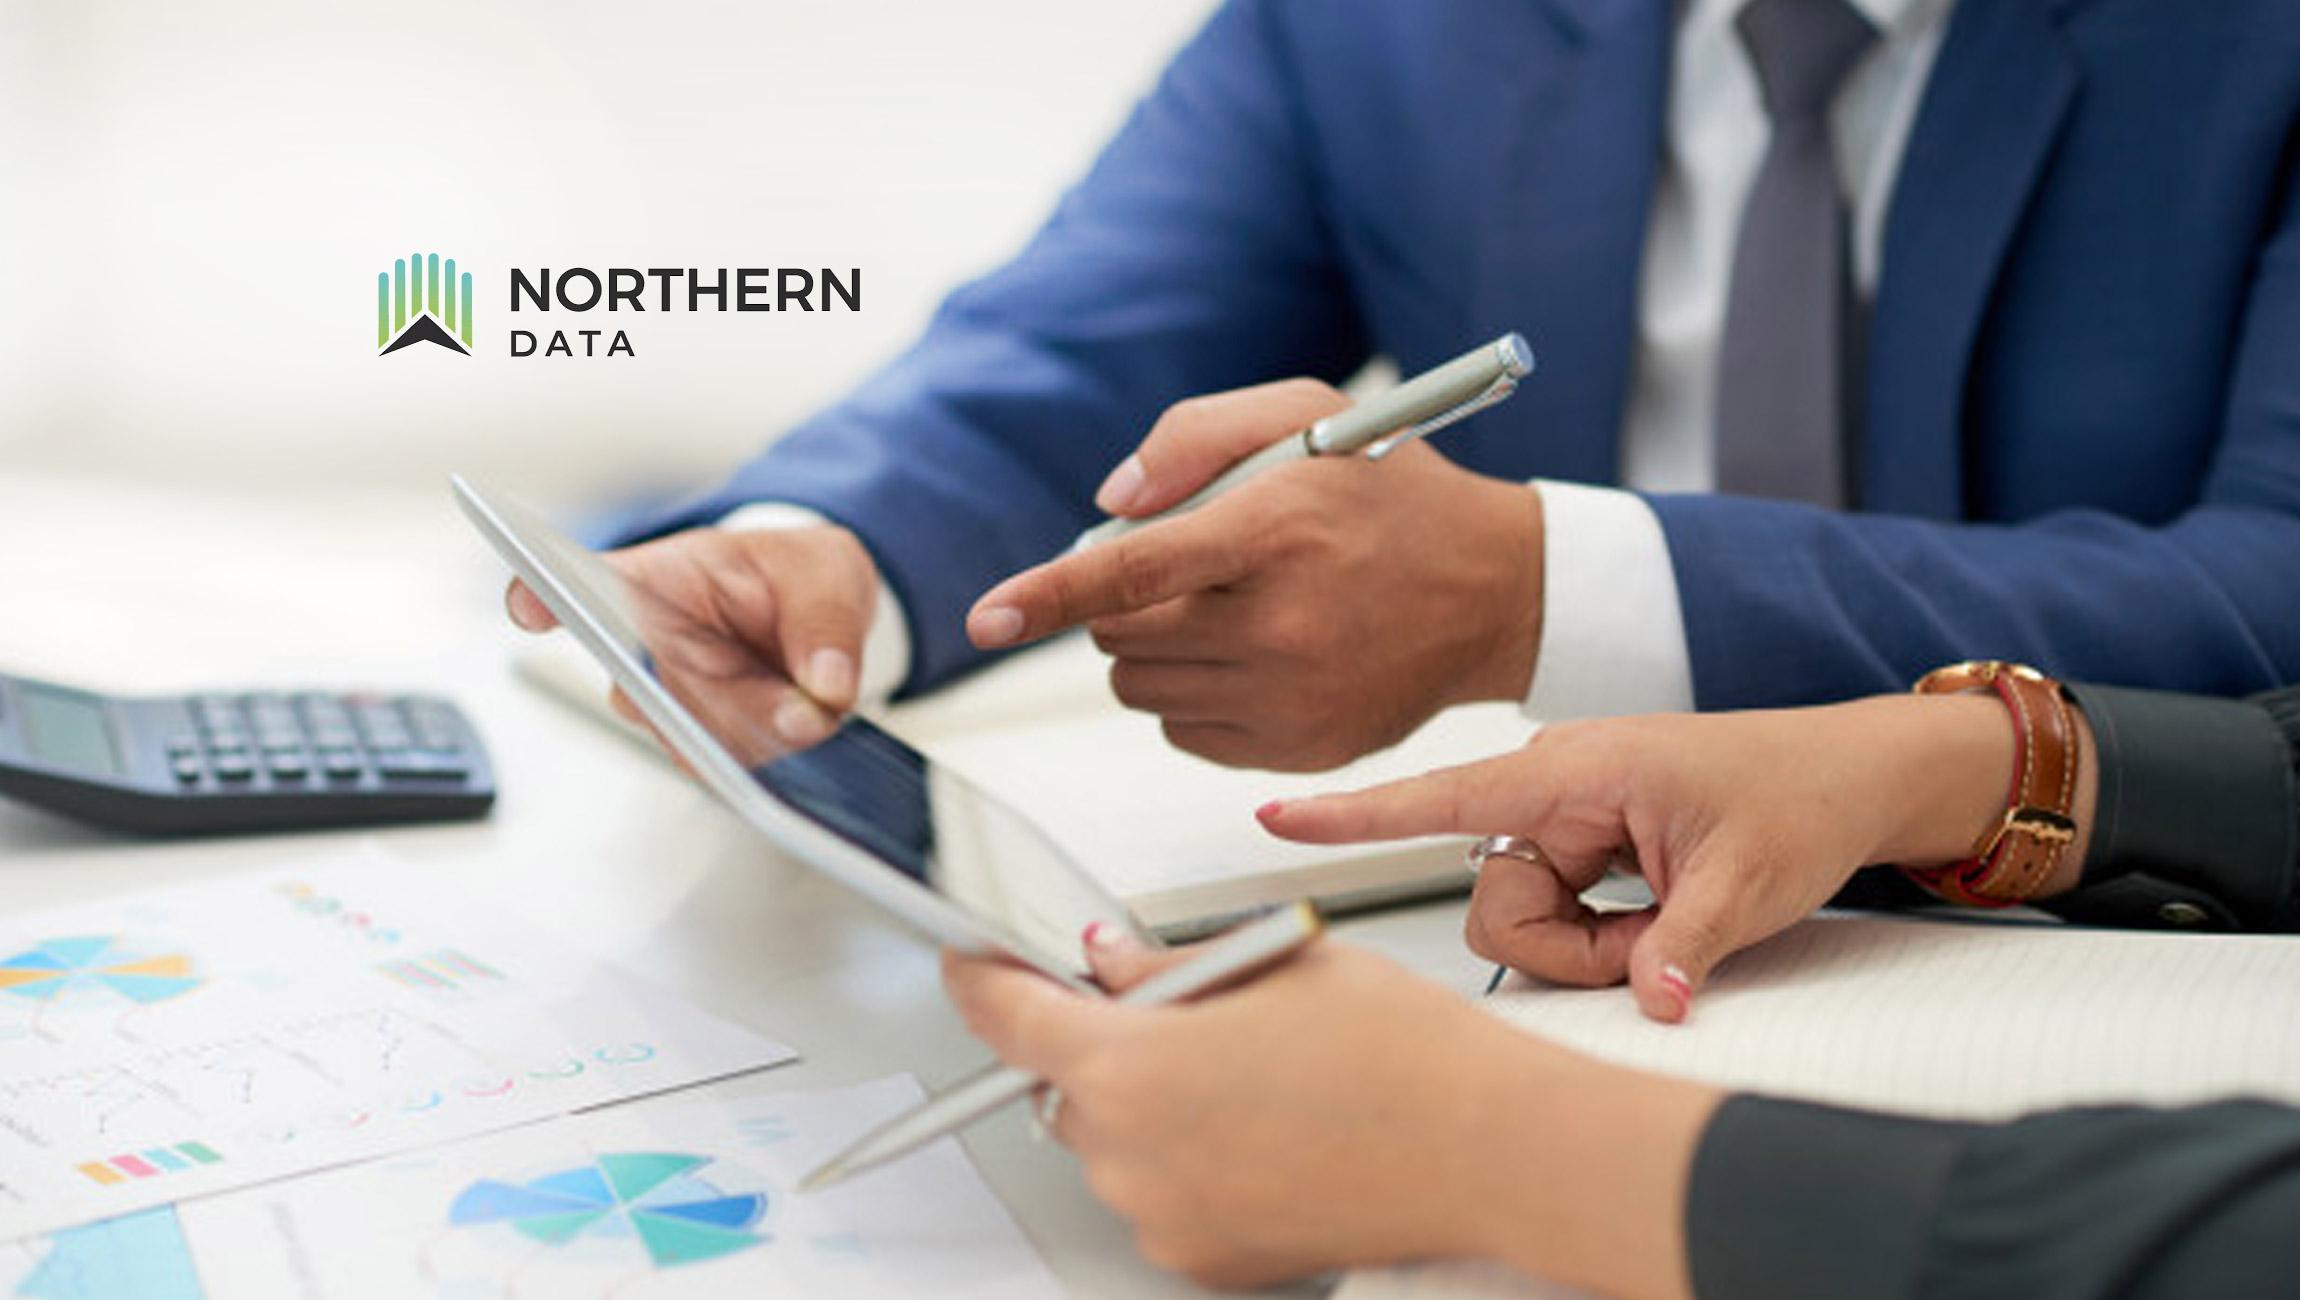 Northern Data: SBI Becomes New Strategic Shareholder